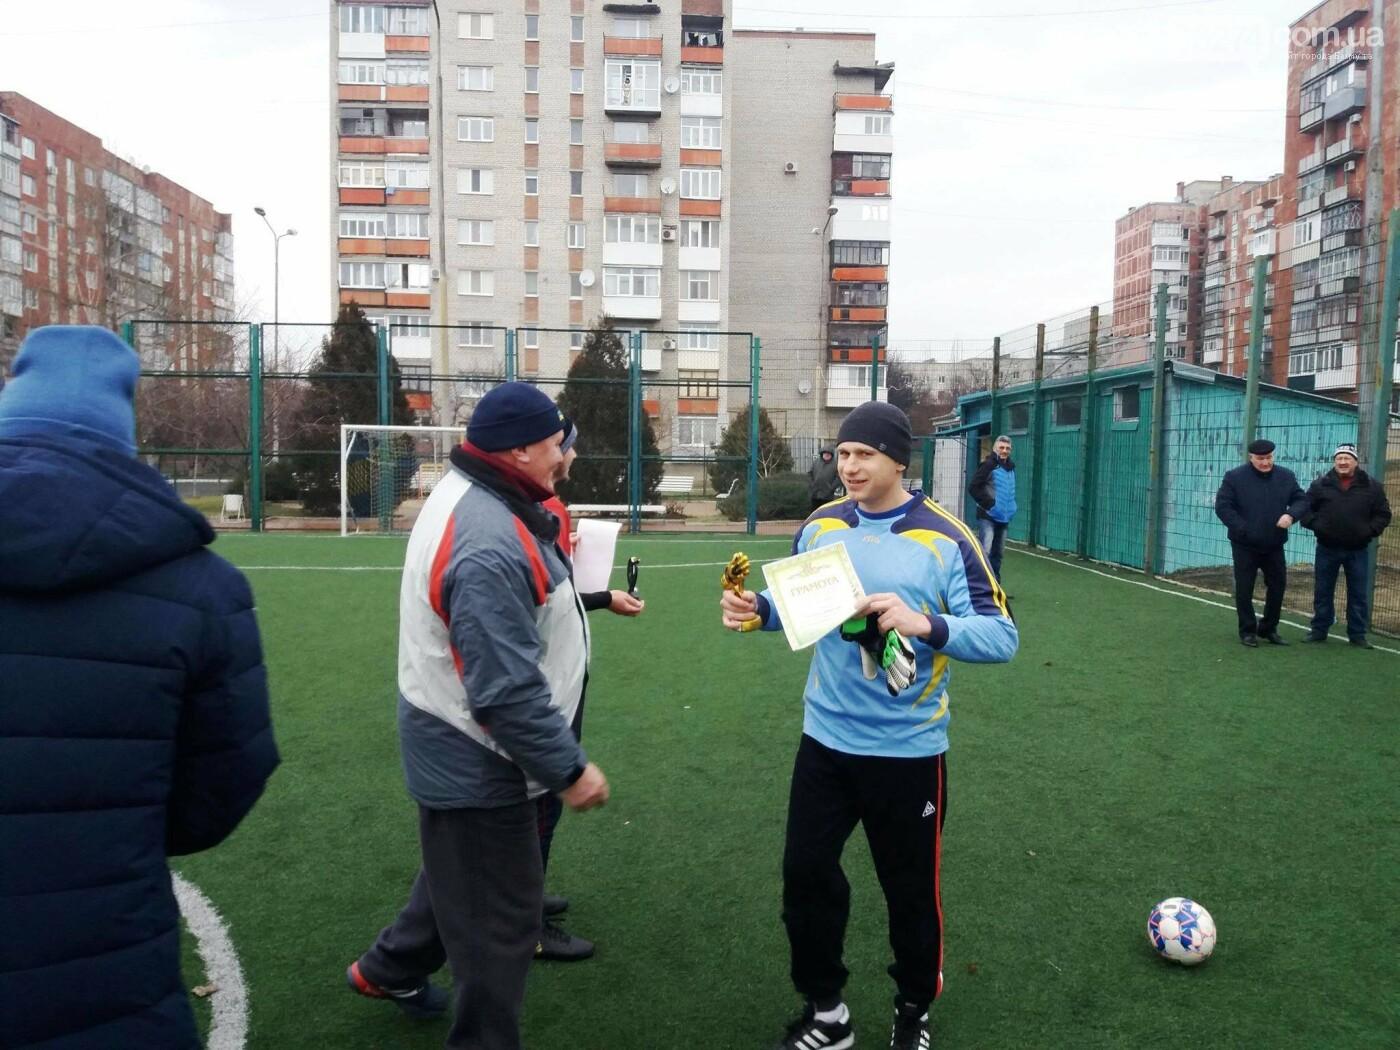 Кубок мэра по футболу из Бахмута отправился в Троицкое, фото-5